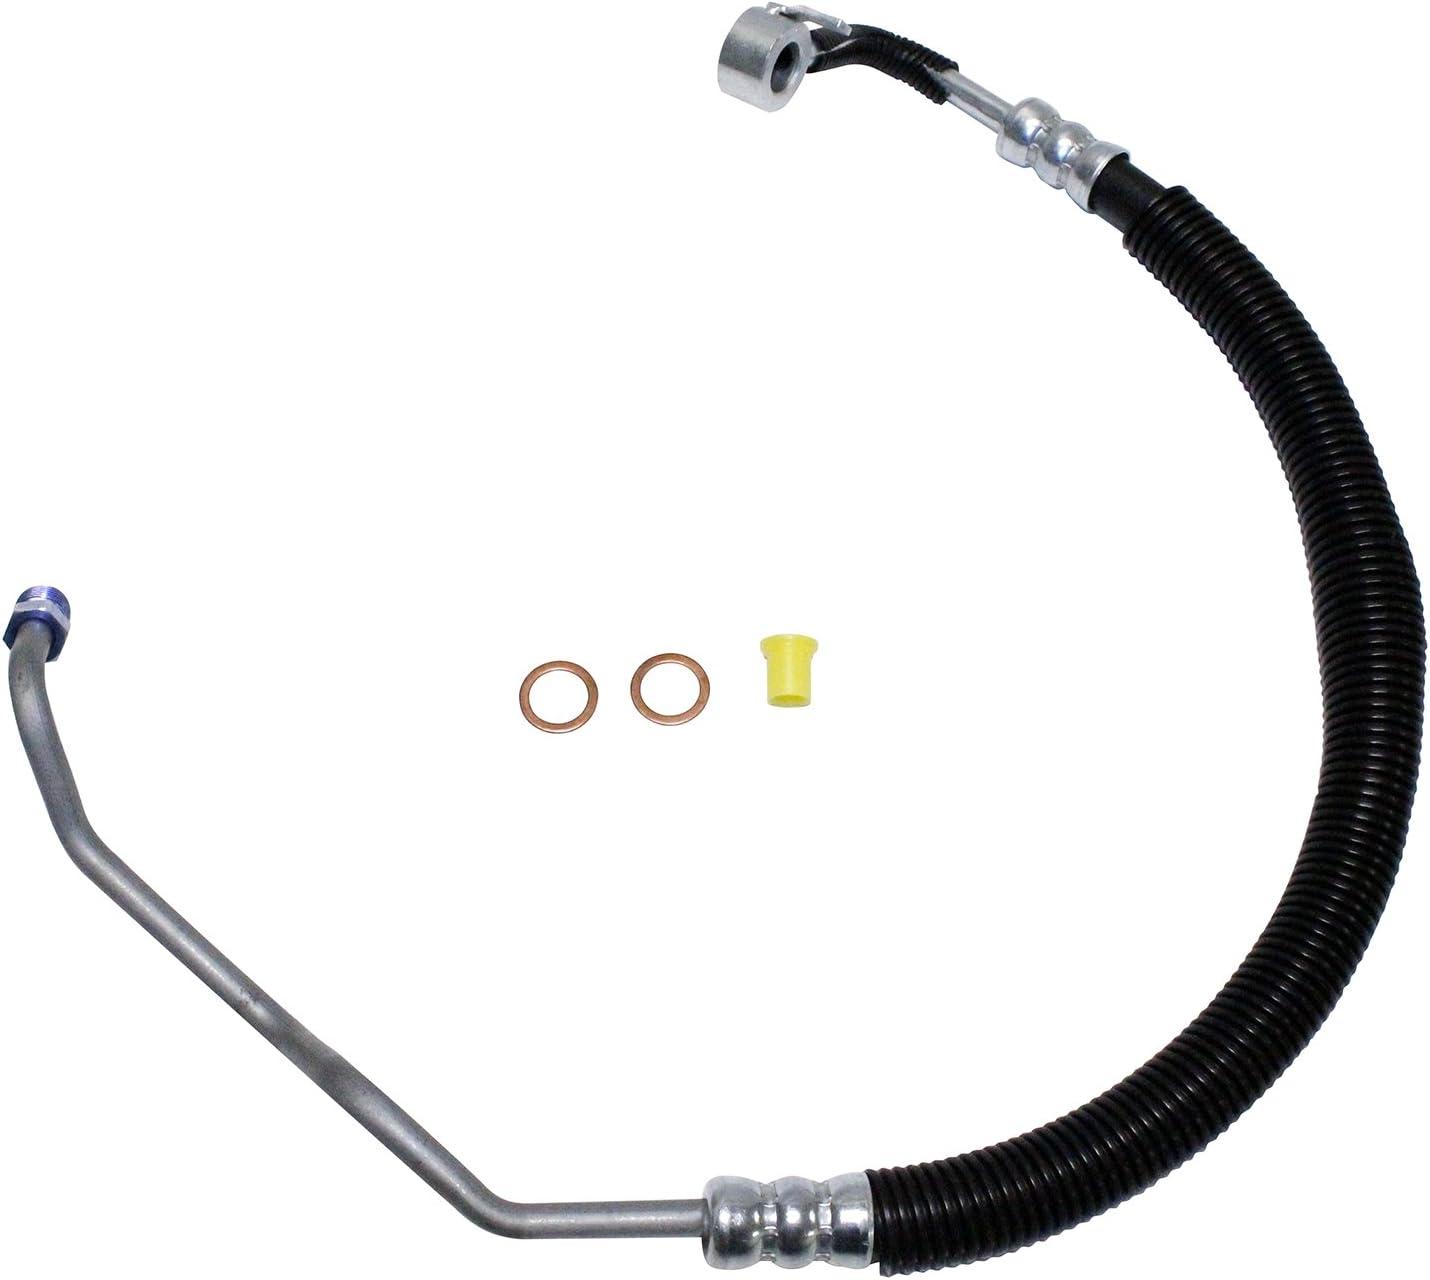 Edelmann 92233 Power Steering Pressure Line Hose Assembly